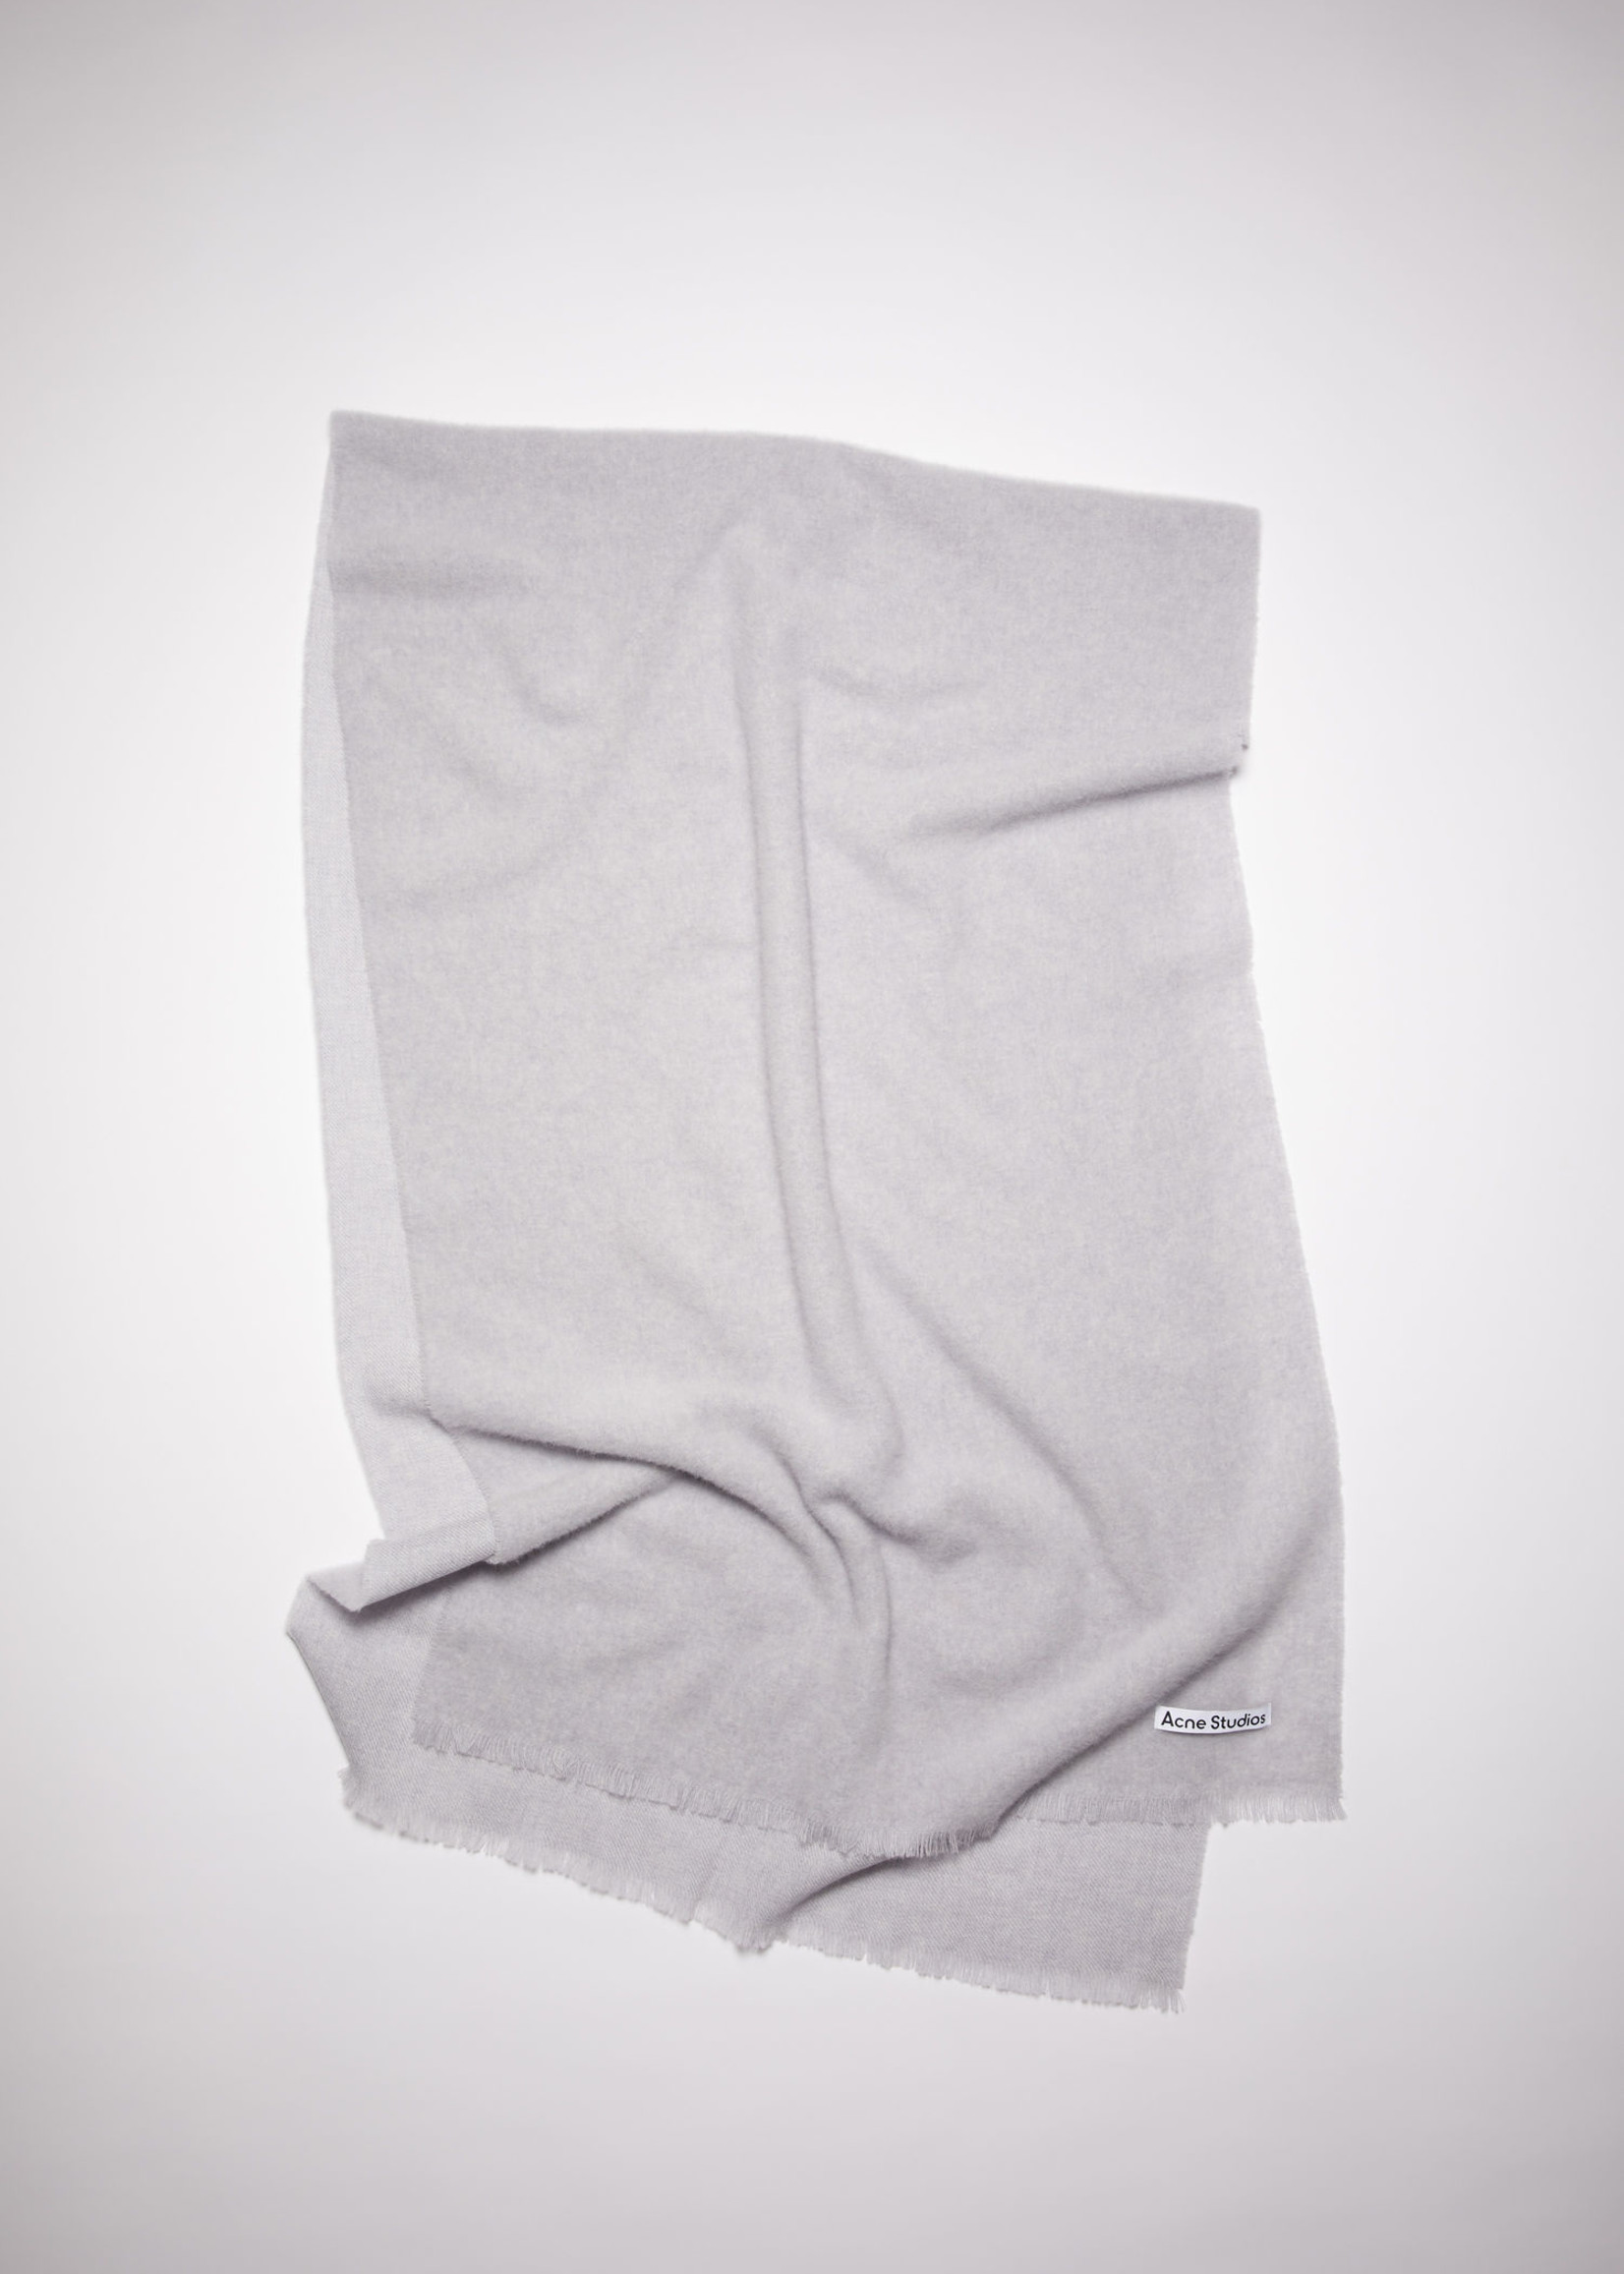 Acnestudios Acnestudios  scarf light grey melange